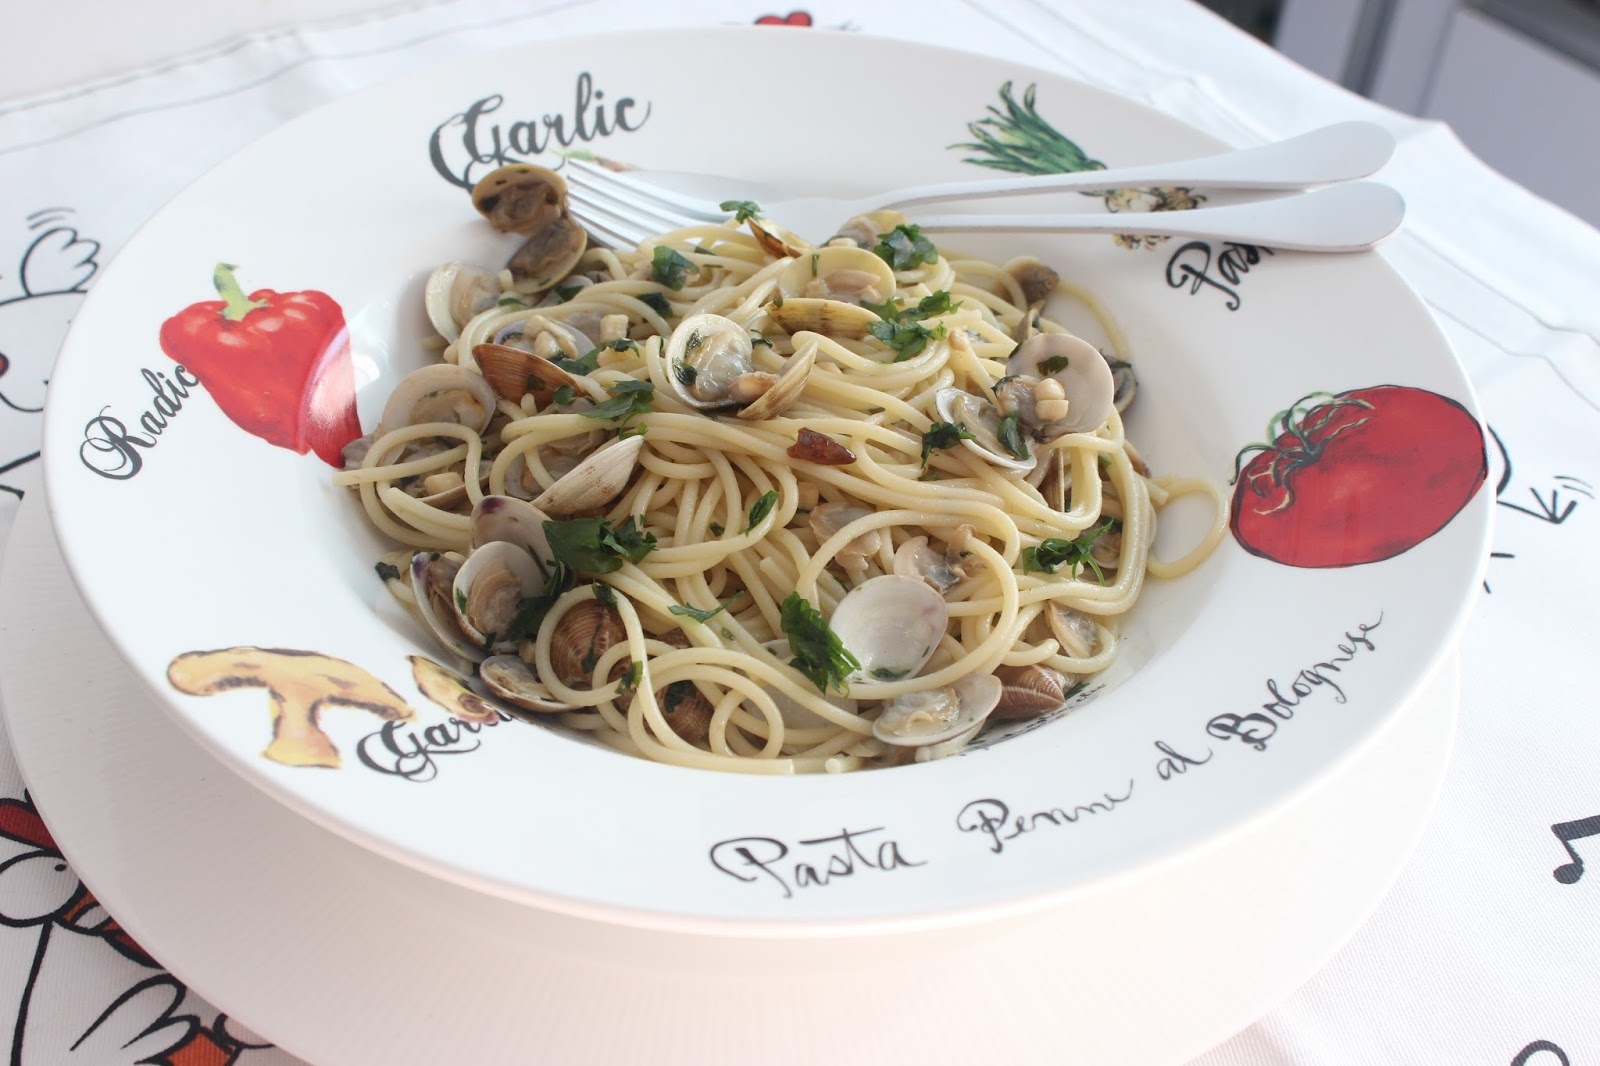 Espaguetis con almejas spaguetti alle vongole las - Espaguetis con almejas ...